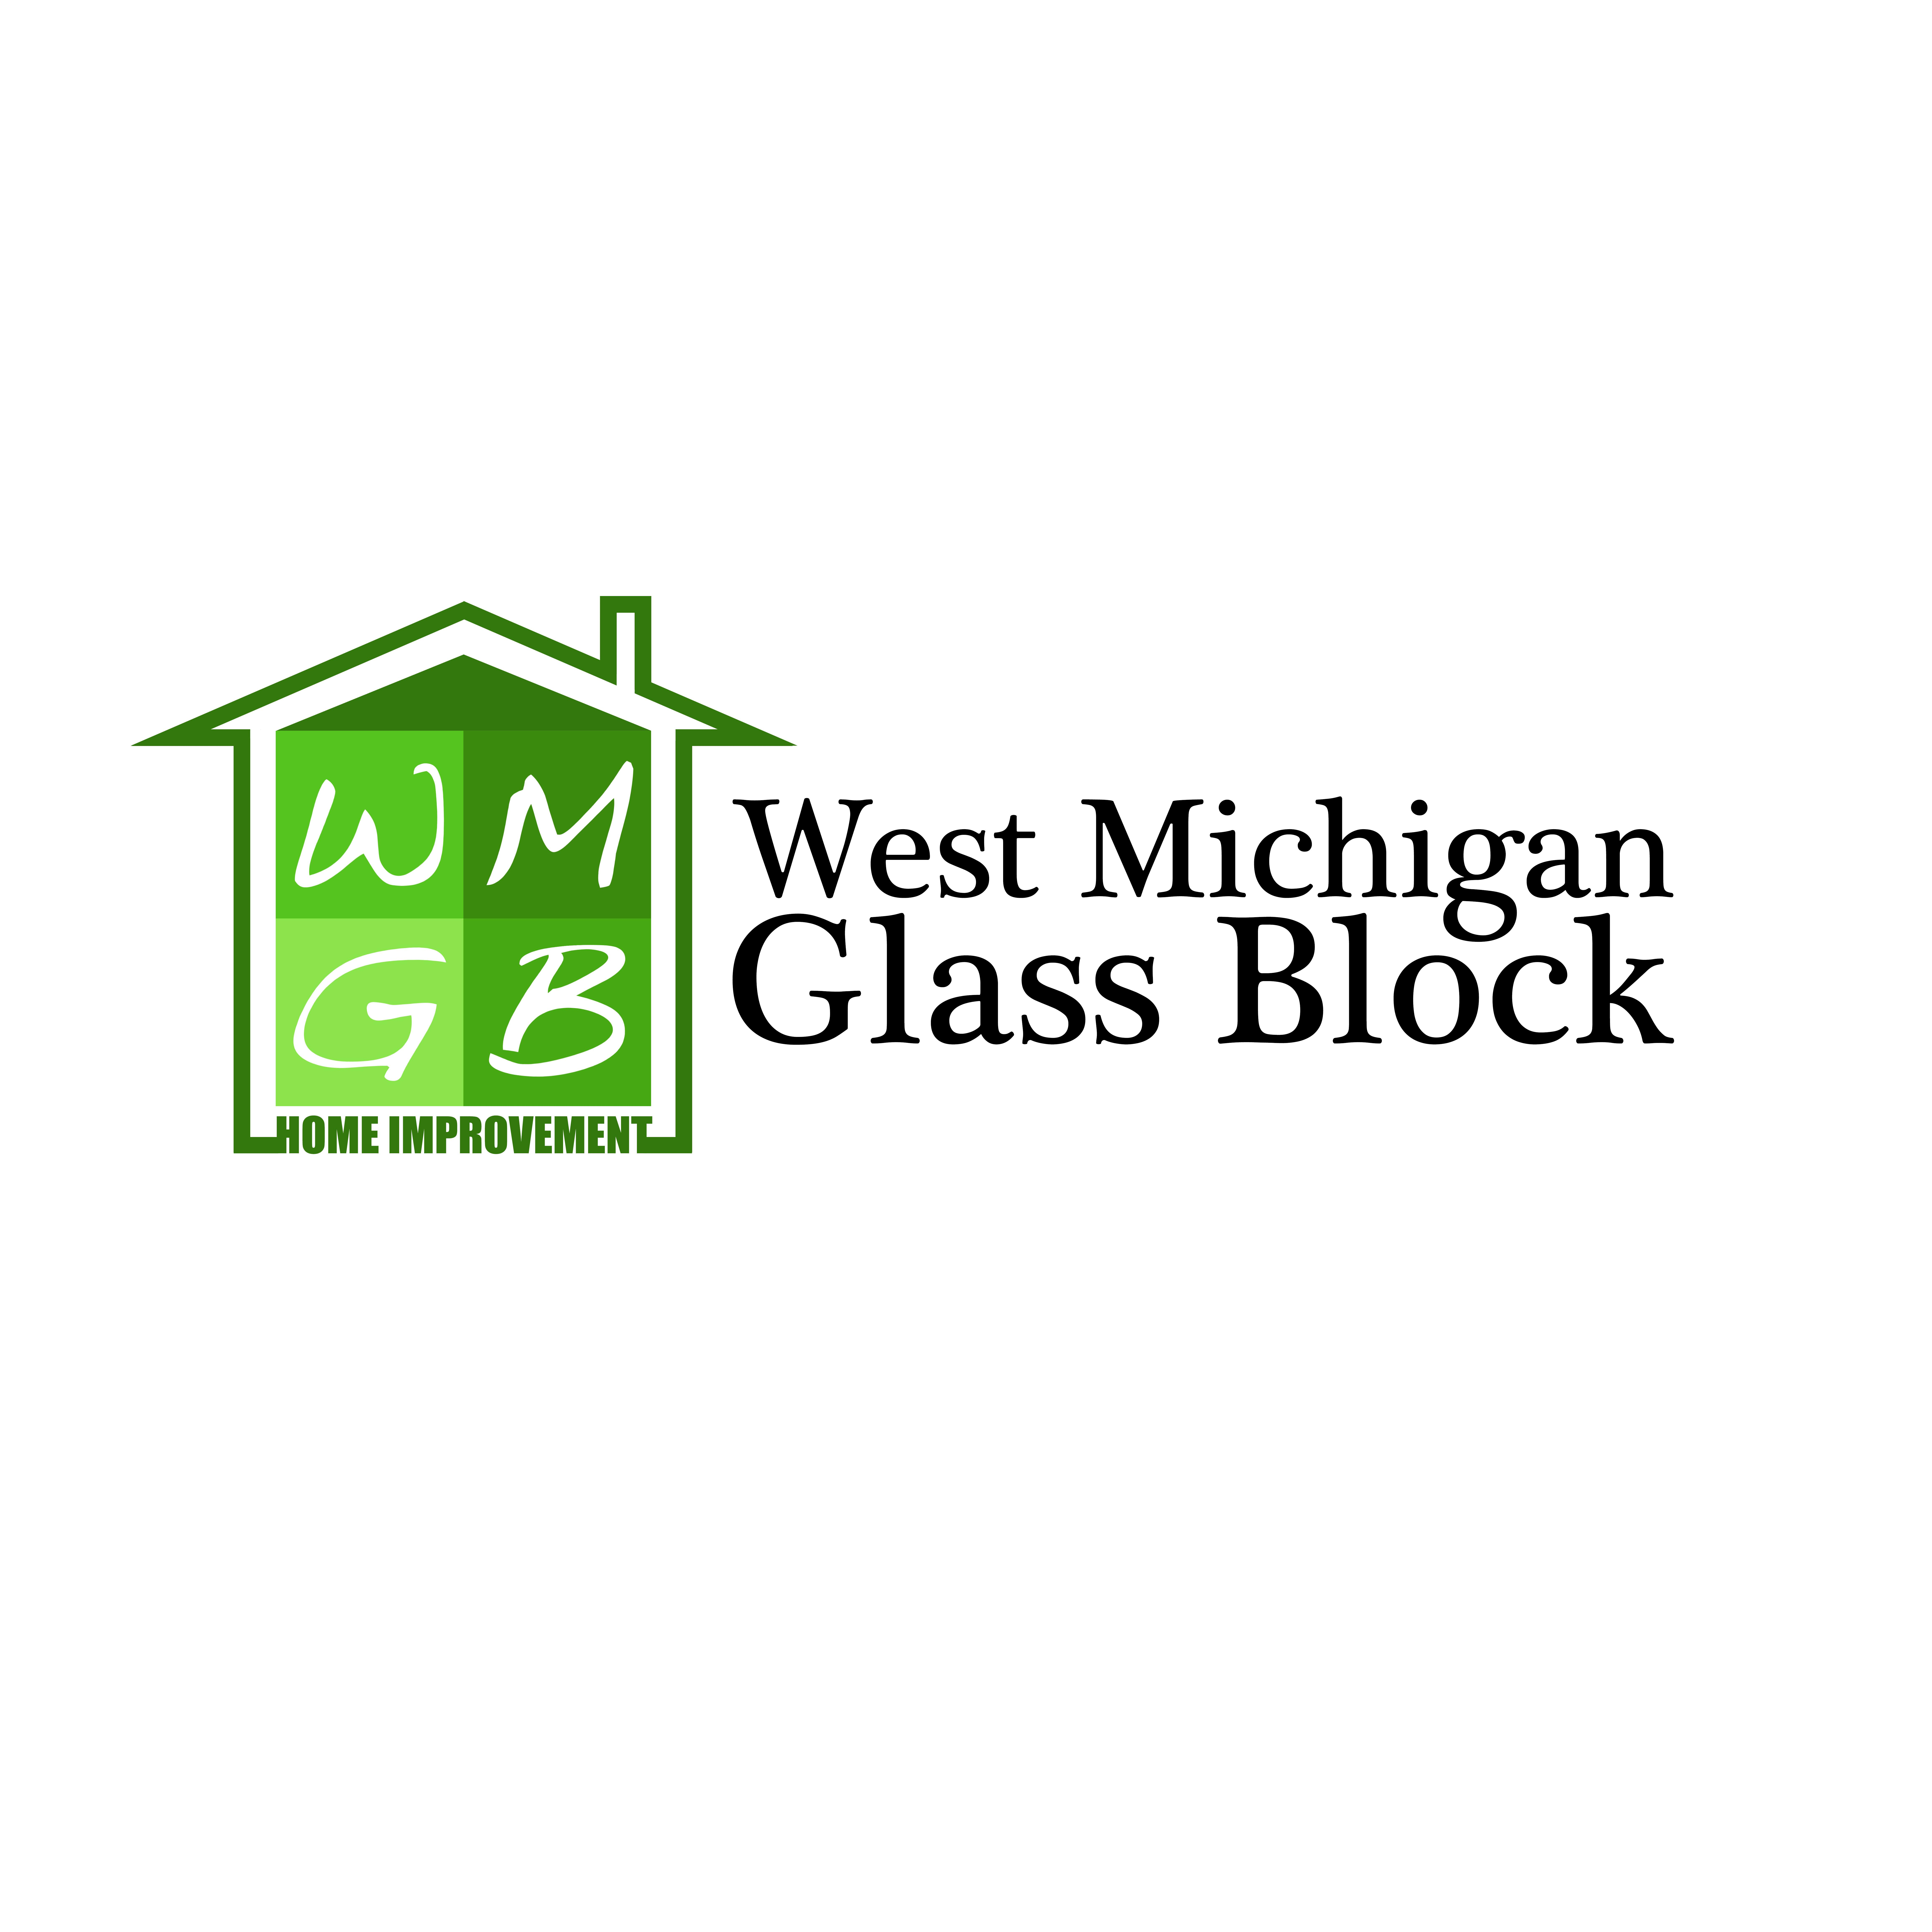 West Michigan Glass Block